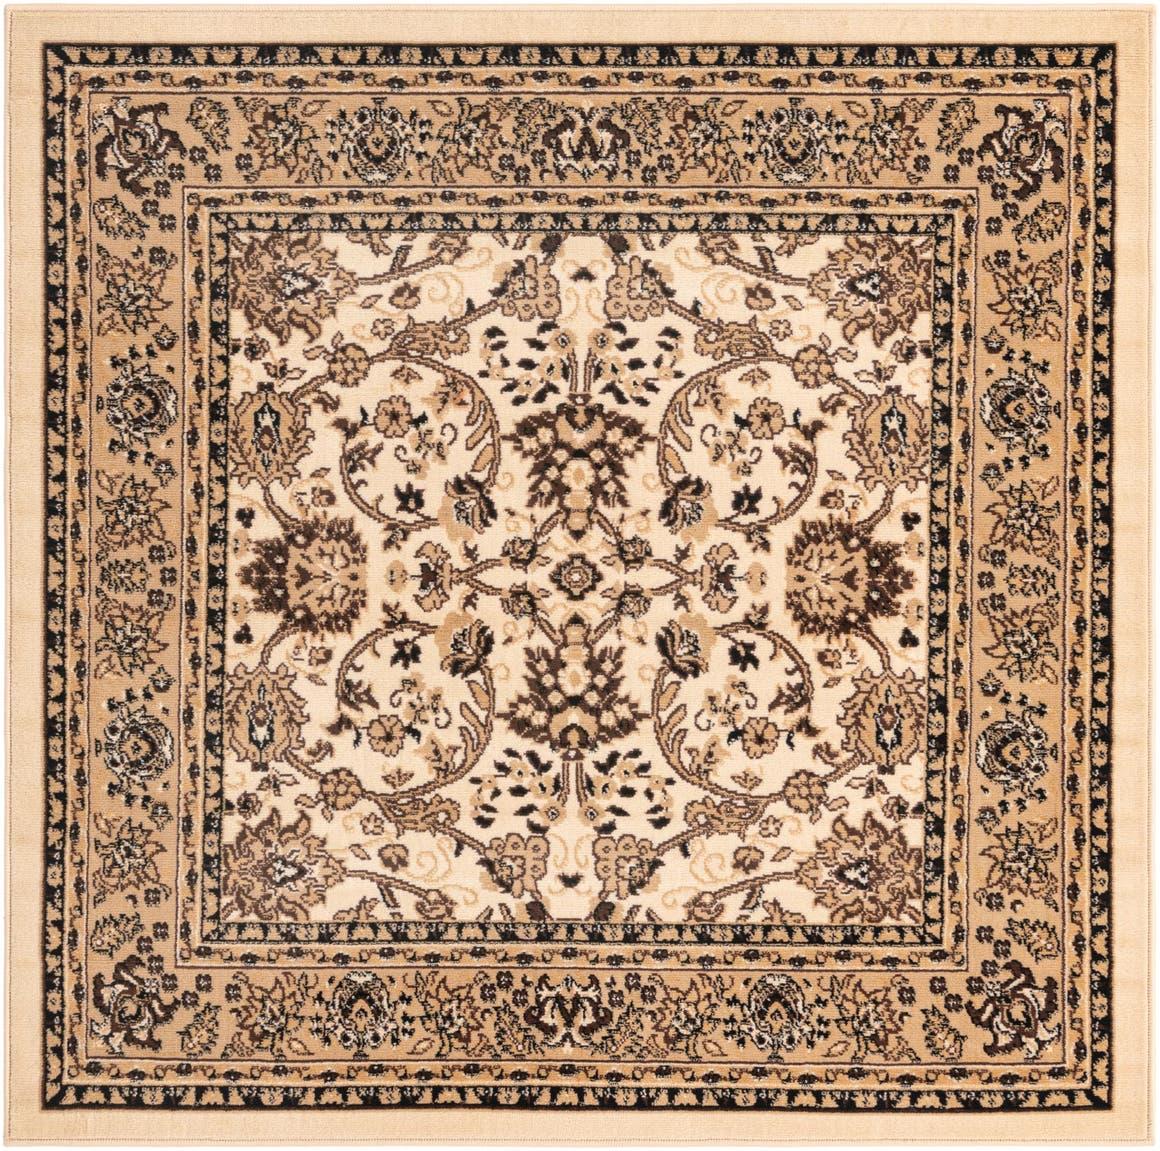 5' x 5' Kashan Design Square Rug main image